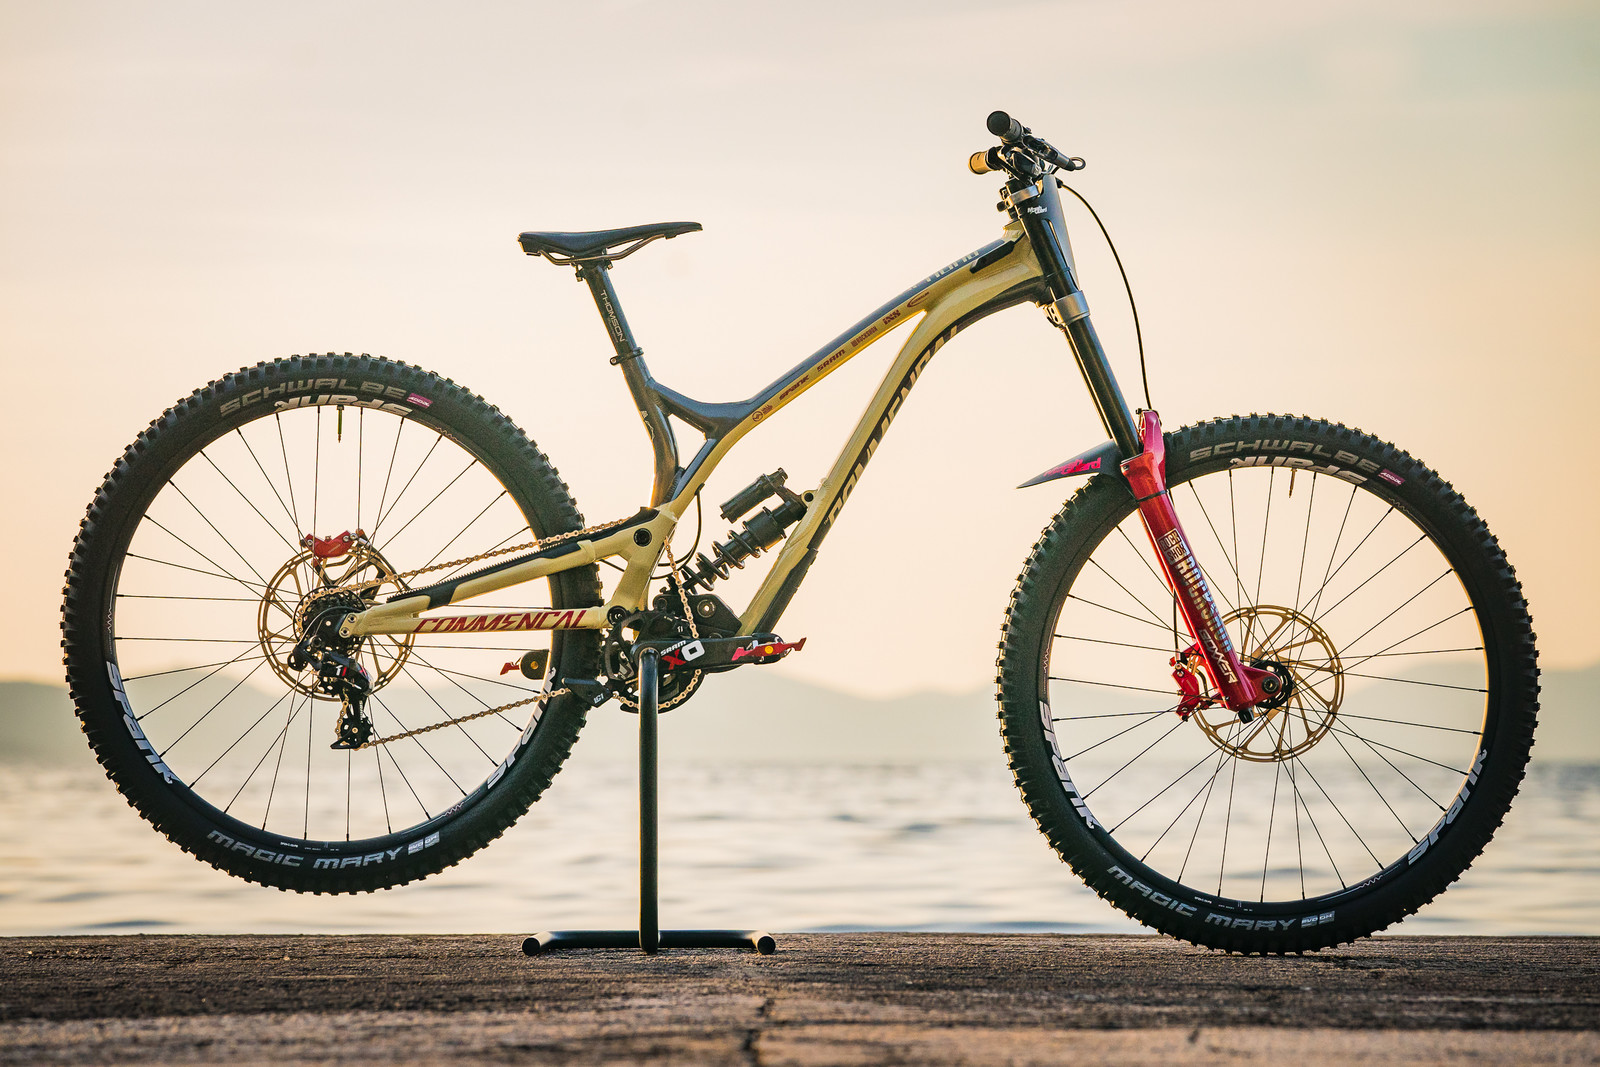 Amaury Pierron's Commencal Supreme DH 29 - 2018 Losinj World Cup Pit Bits - Mountain Biking Pictures - Vital MTB